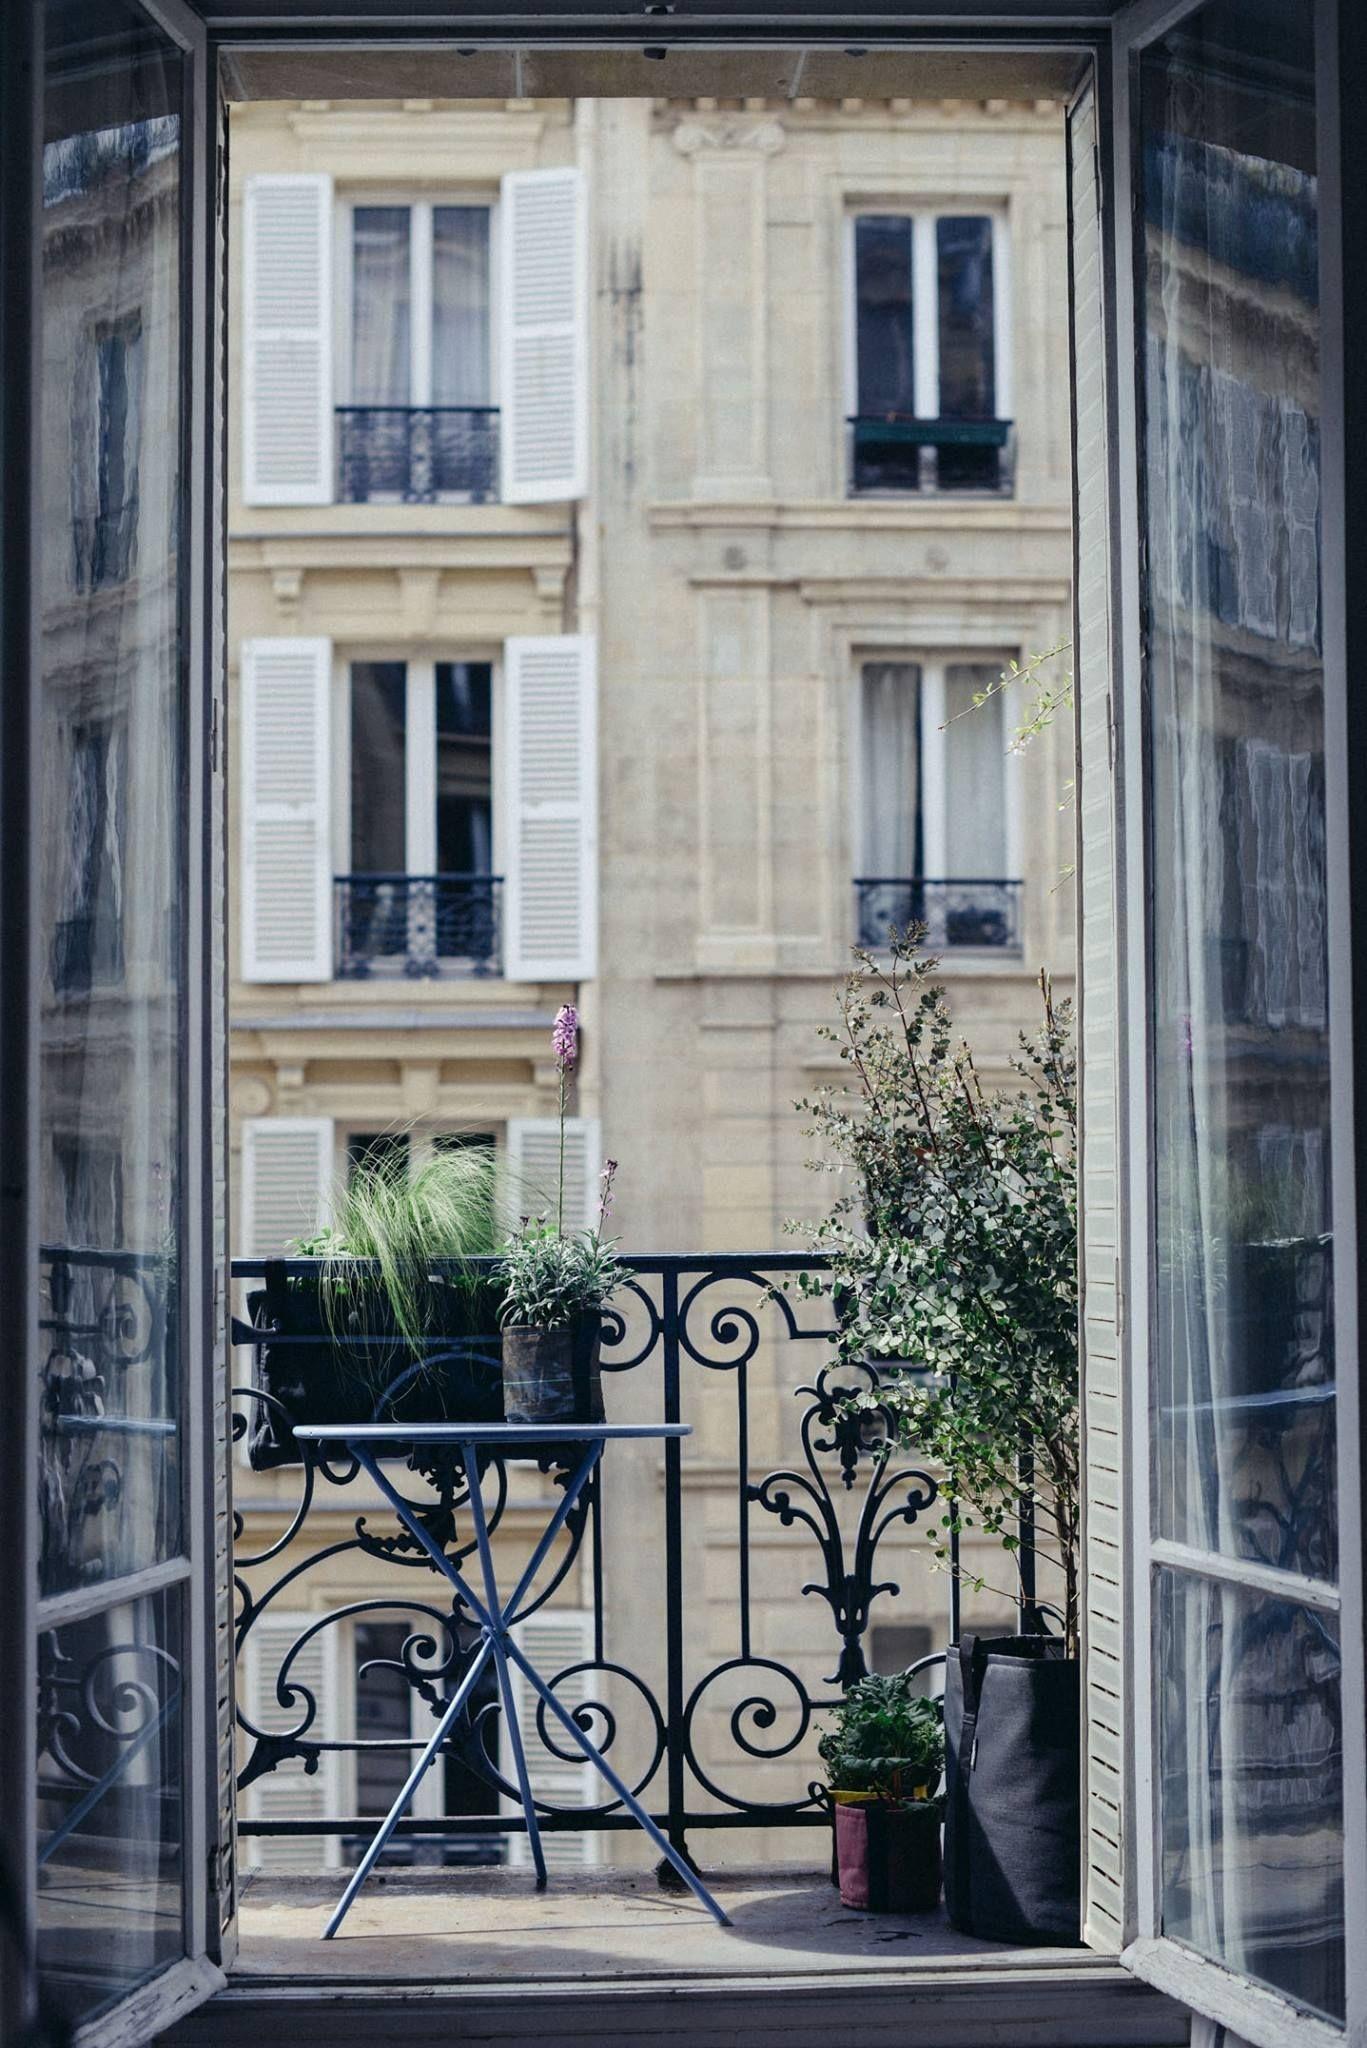 Pariser Balkon